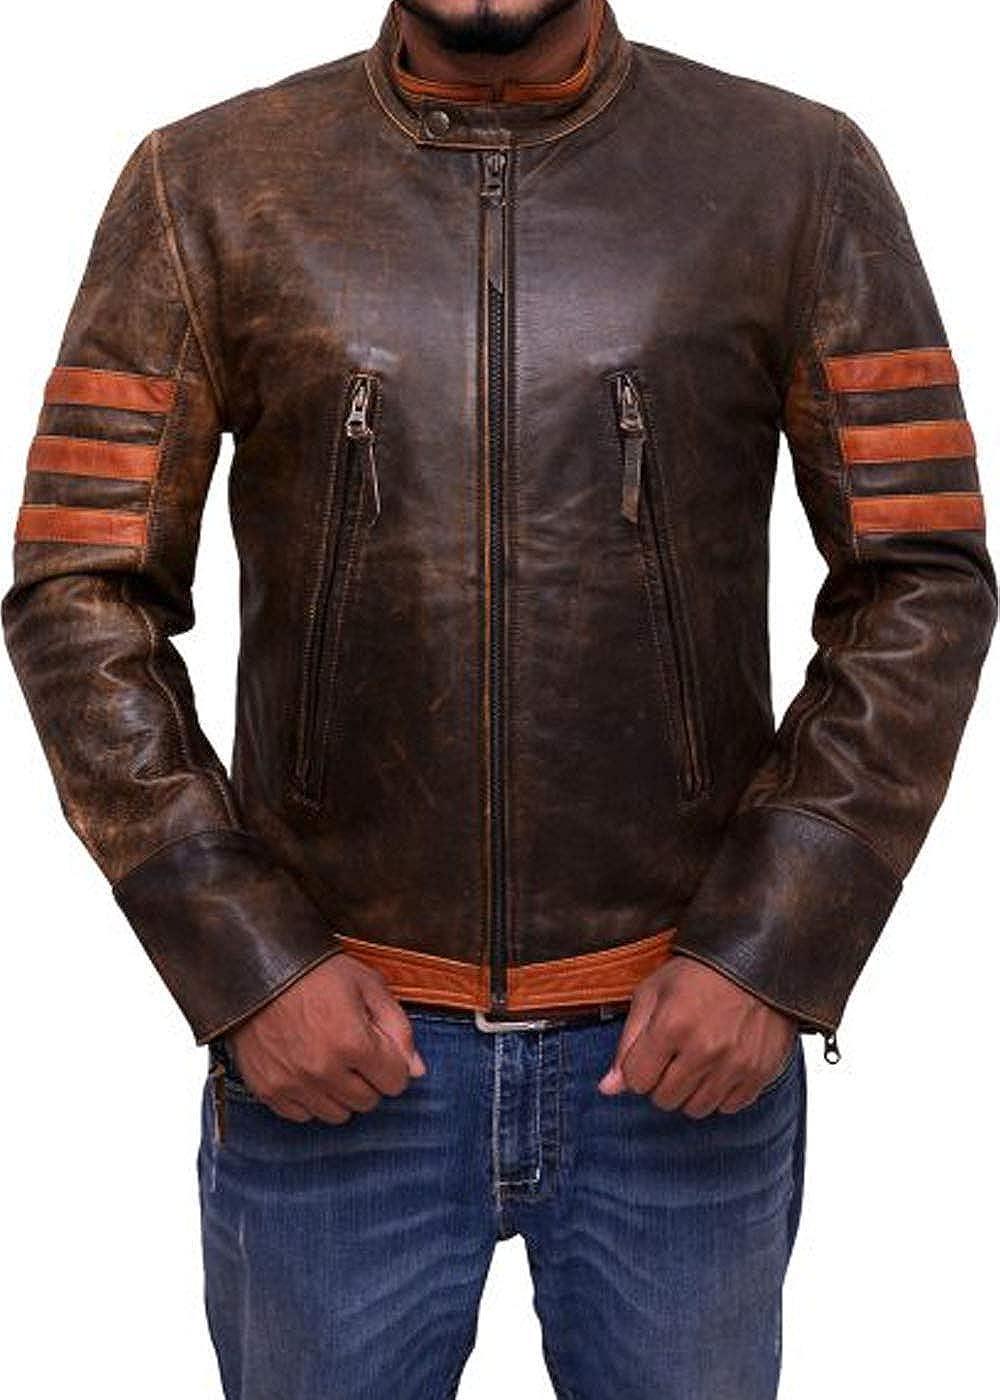 LEATHER NEXT Wolverine X-Men Origins Hugh Jackman Leather Jacket IN STOCK